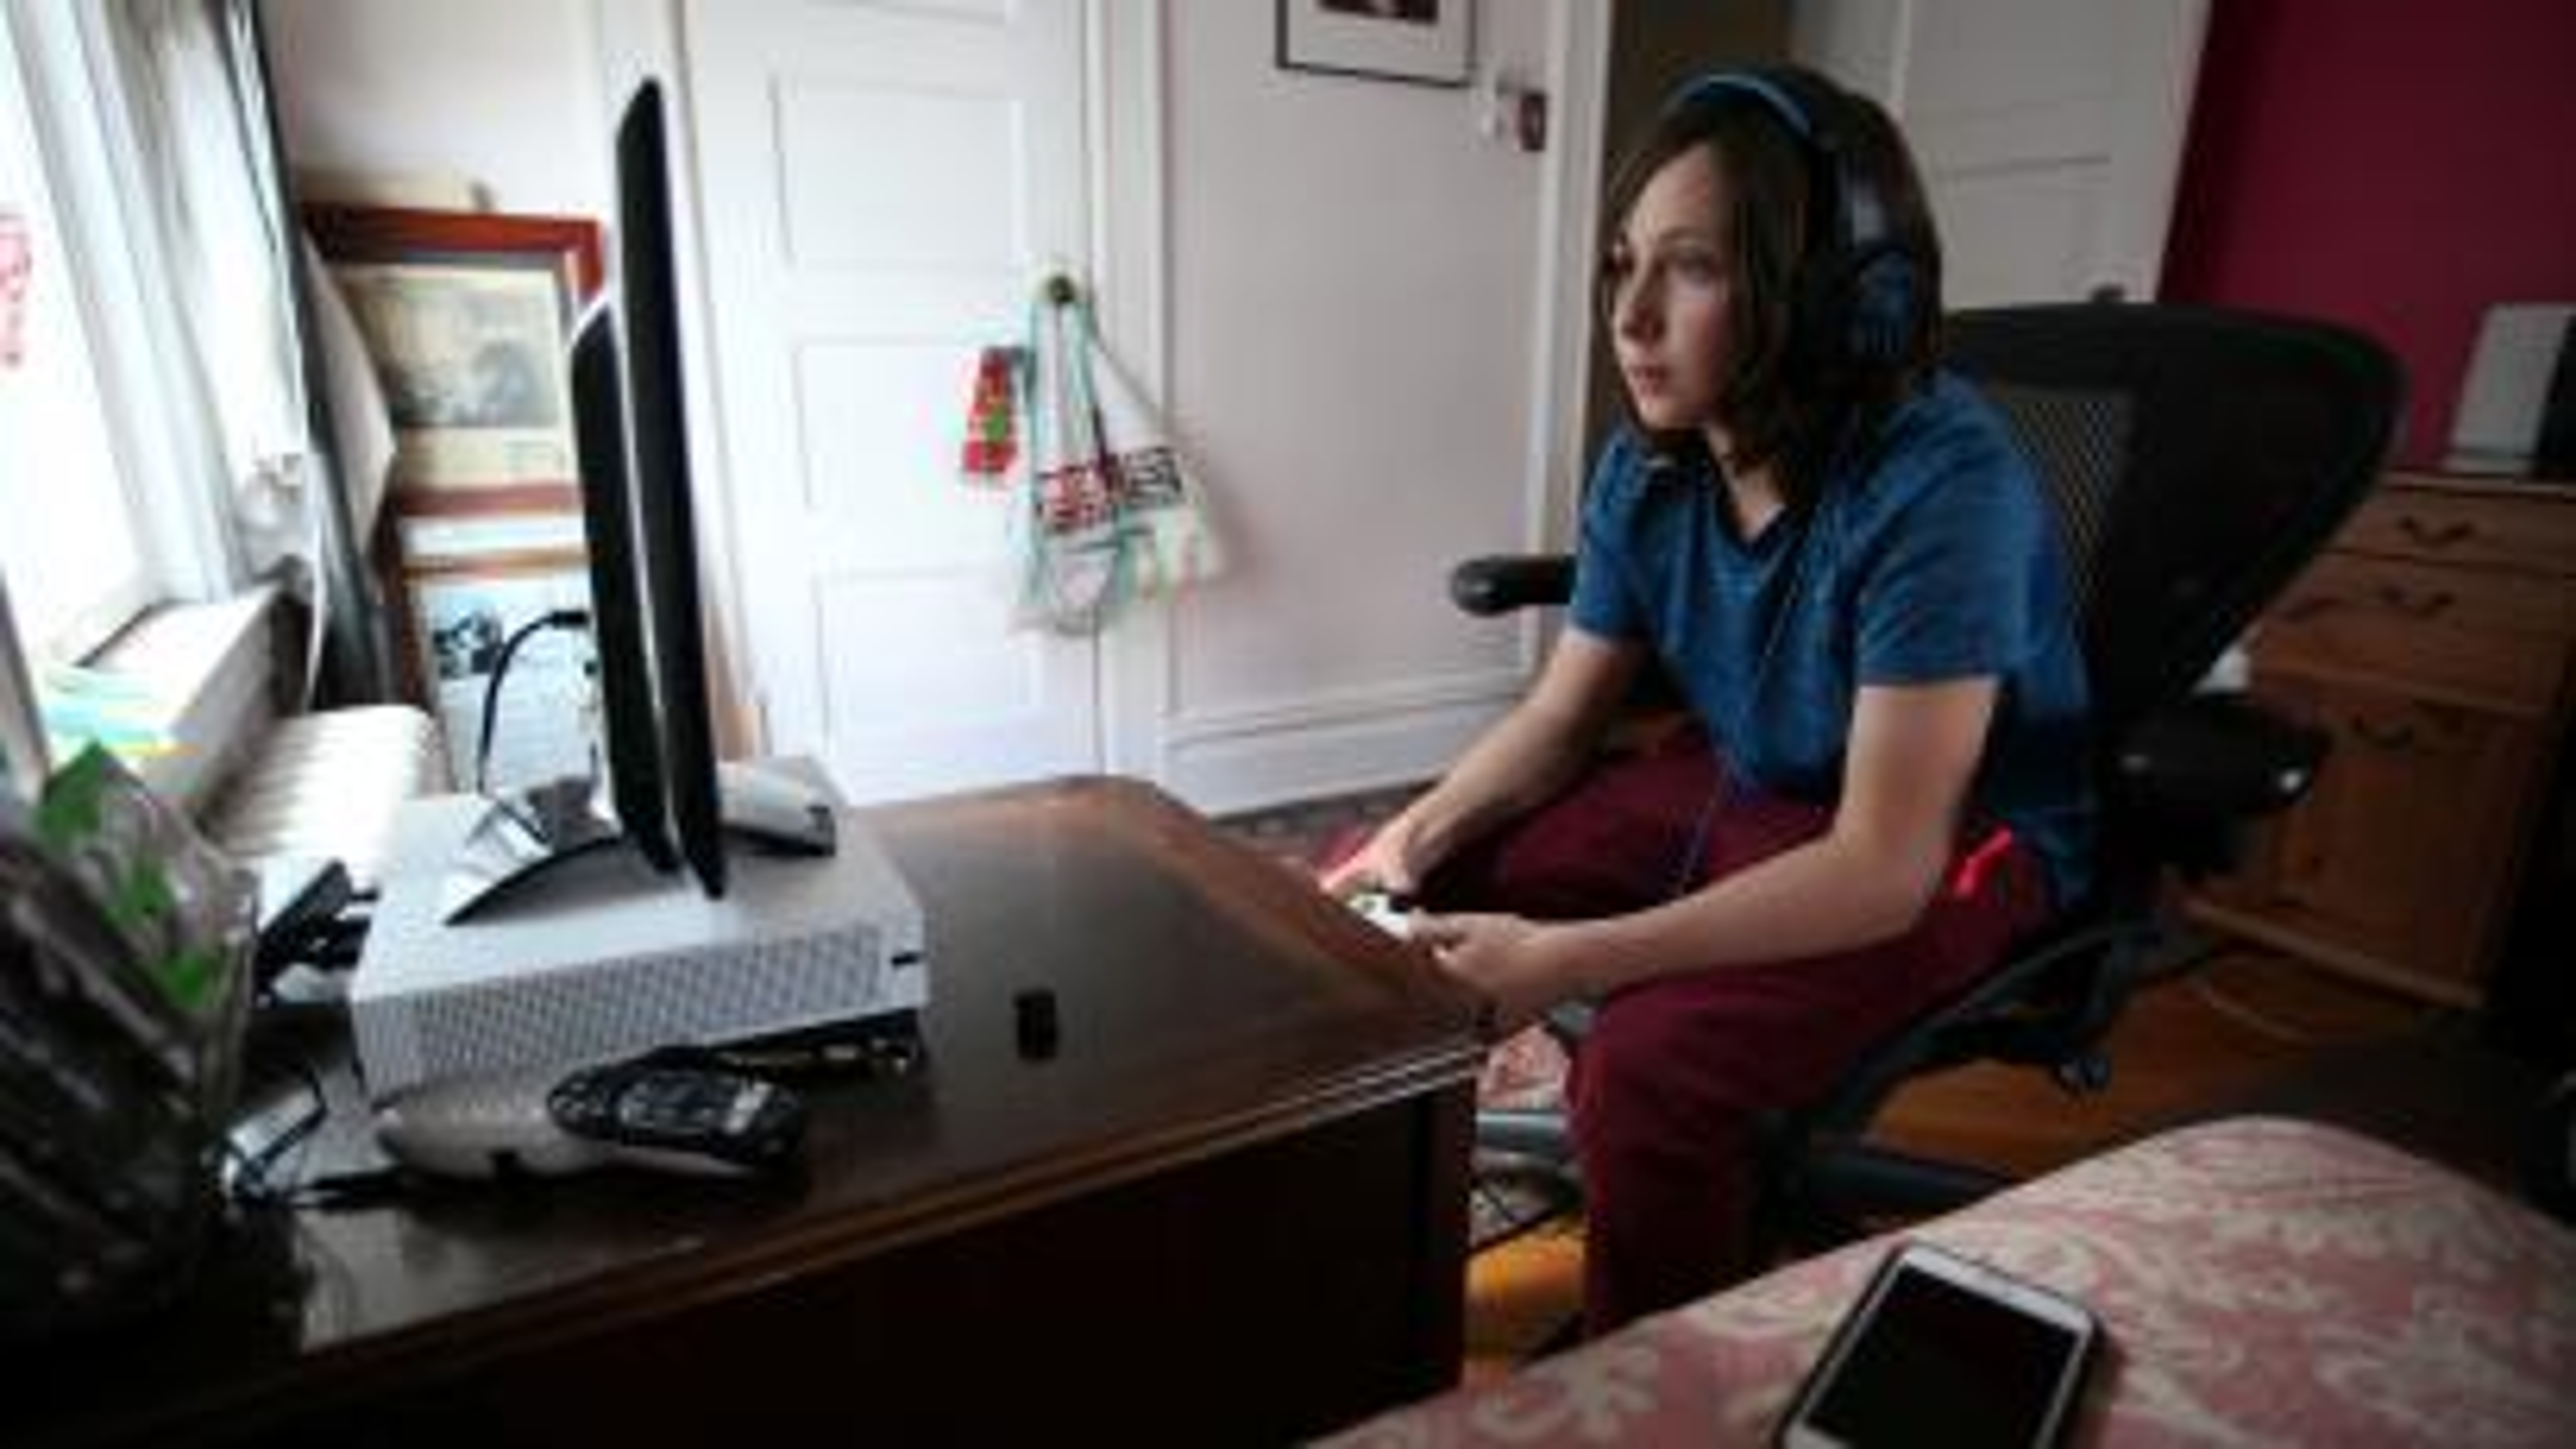 Xbox has new Fortnite cross-play settings for parental control — Quartzy